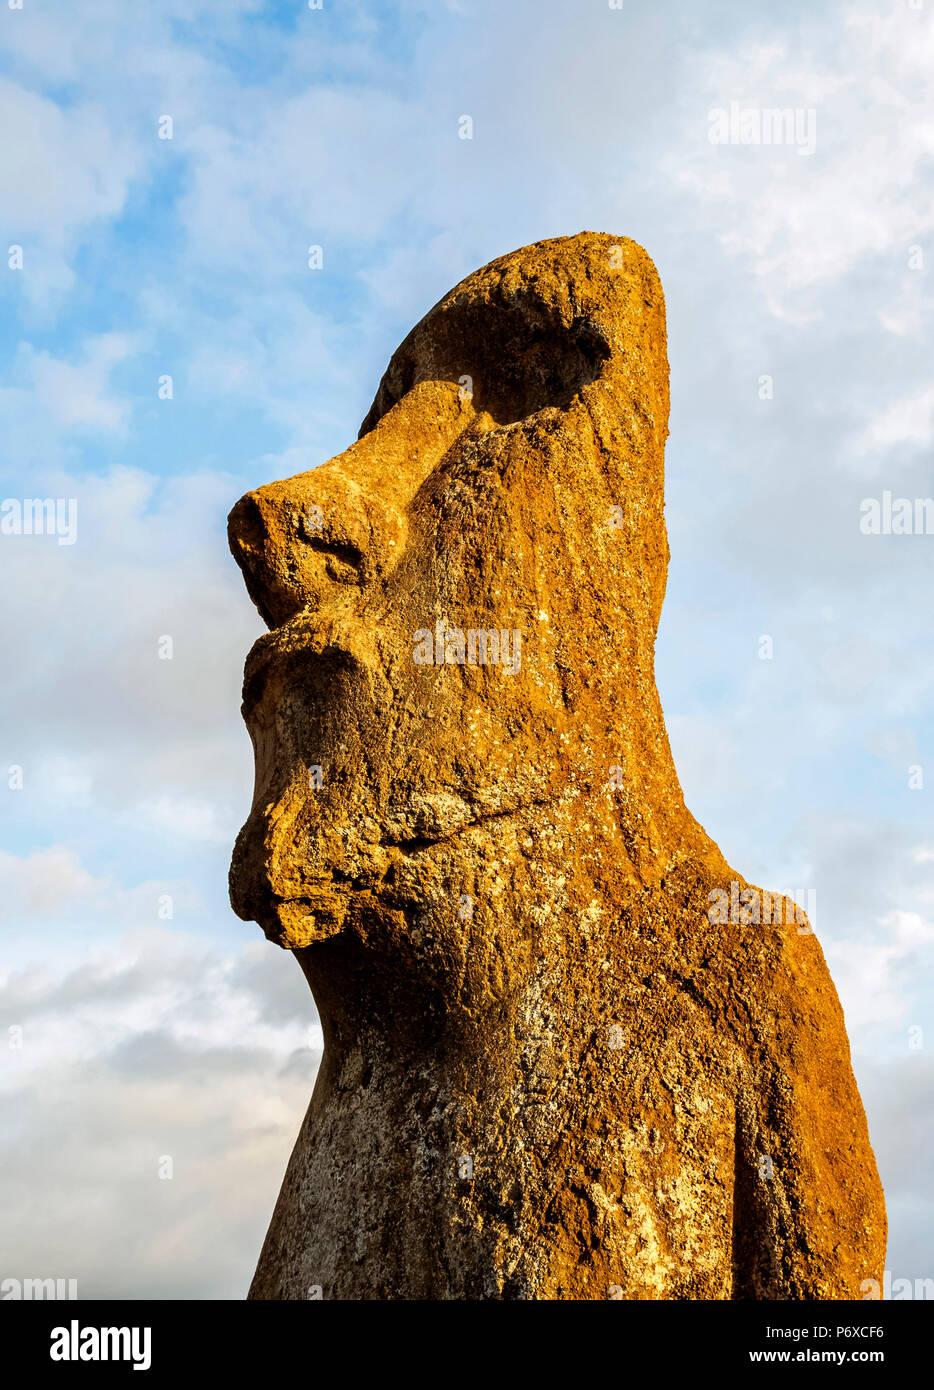 Moai en Ahu Tongariki, el Parque Nacional Rapa Nui, Isla de Pascua, Chile Imagen De Stock